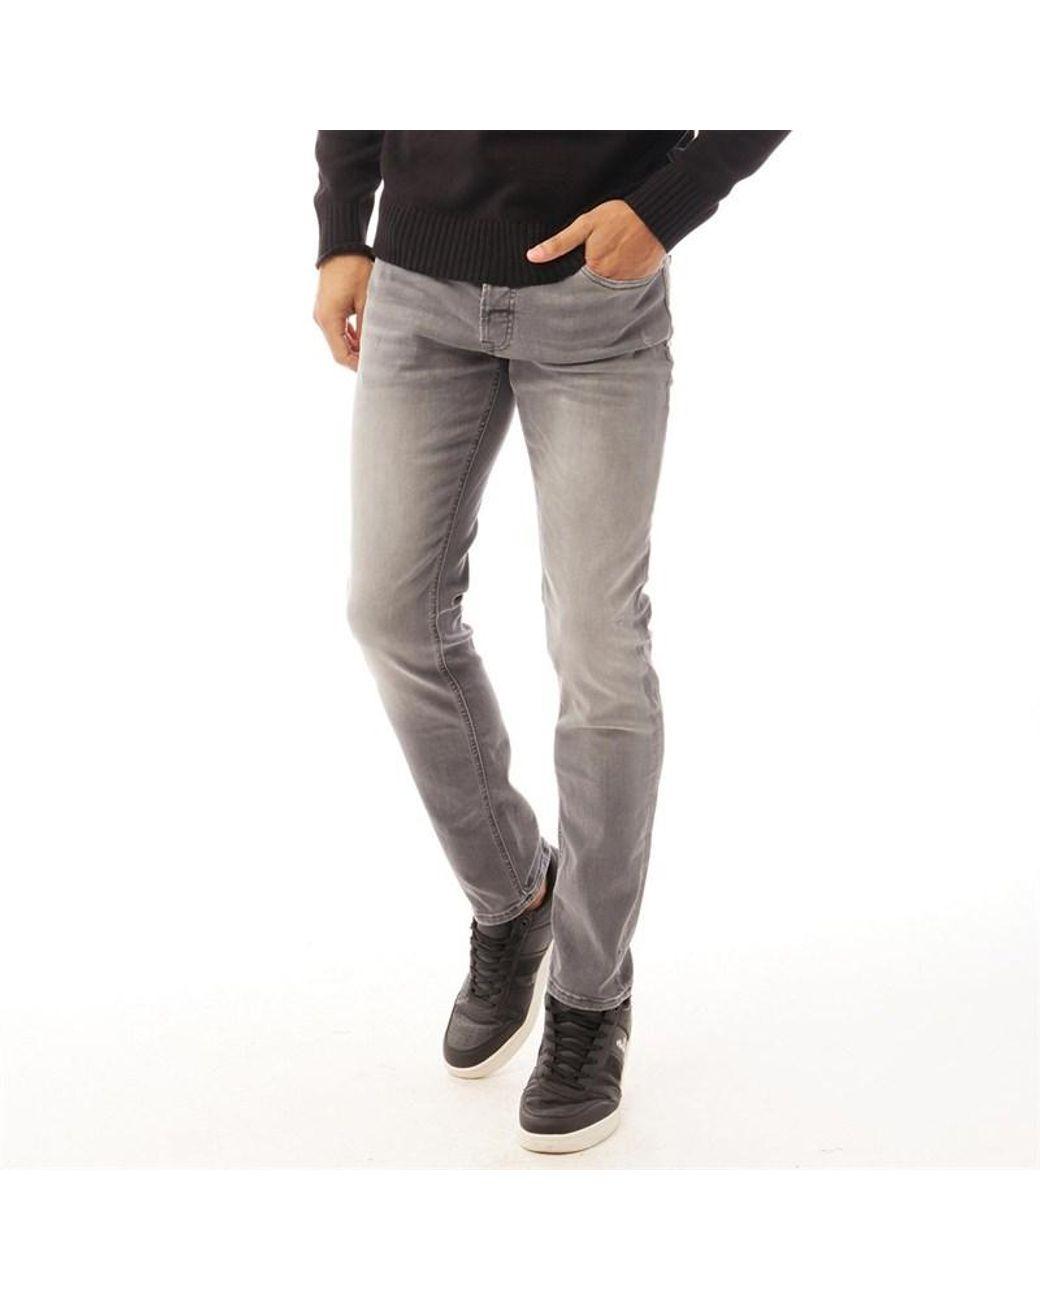 Jack /& Jones Glenn Originals Jeans en Bleu 5 poches-effet vieilli